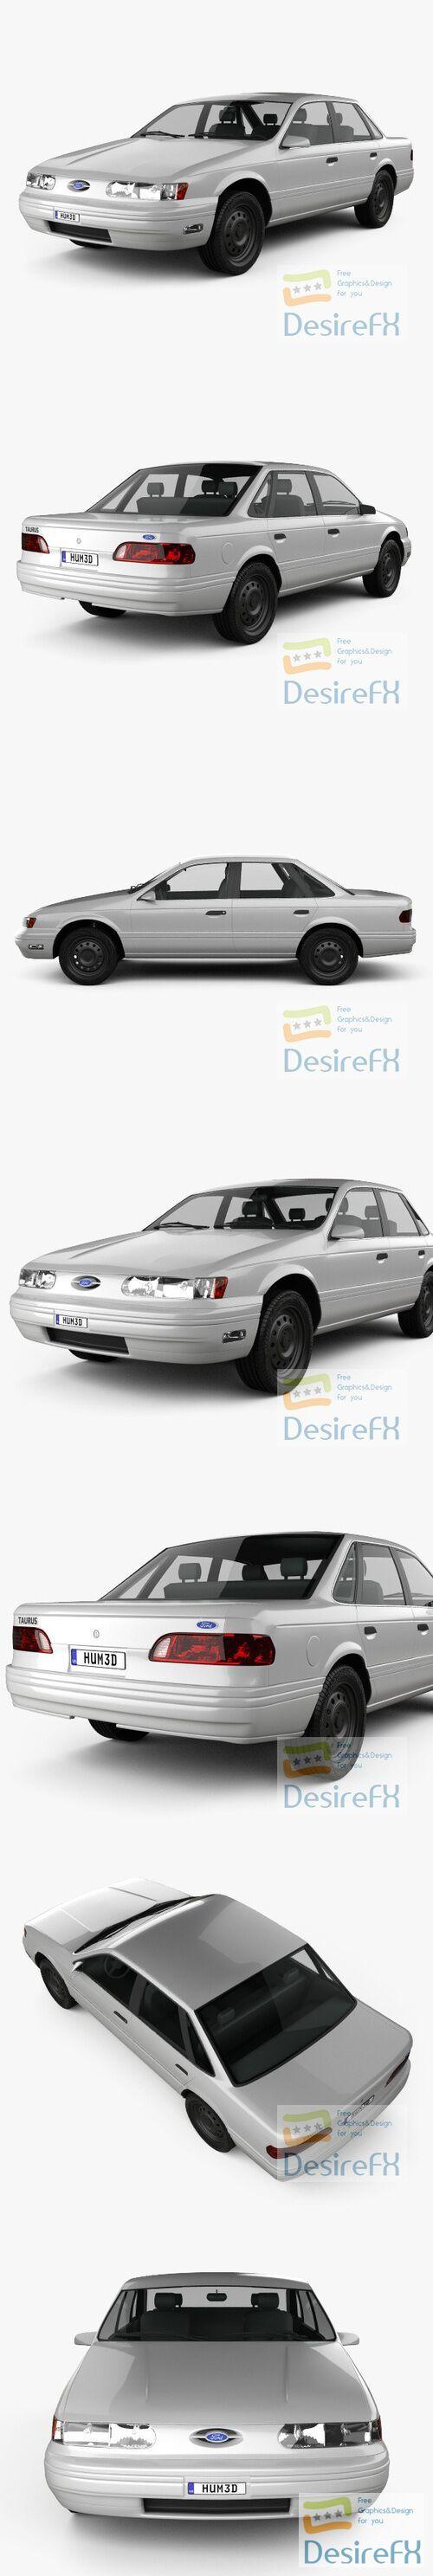 Ford Taurus 1992 3D Model